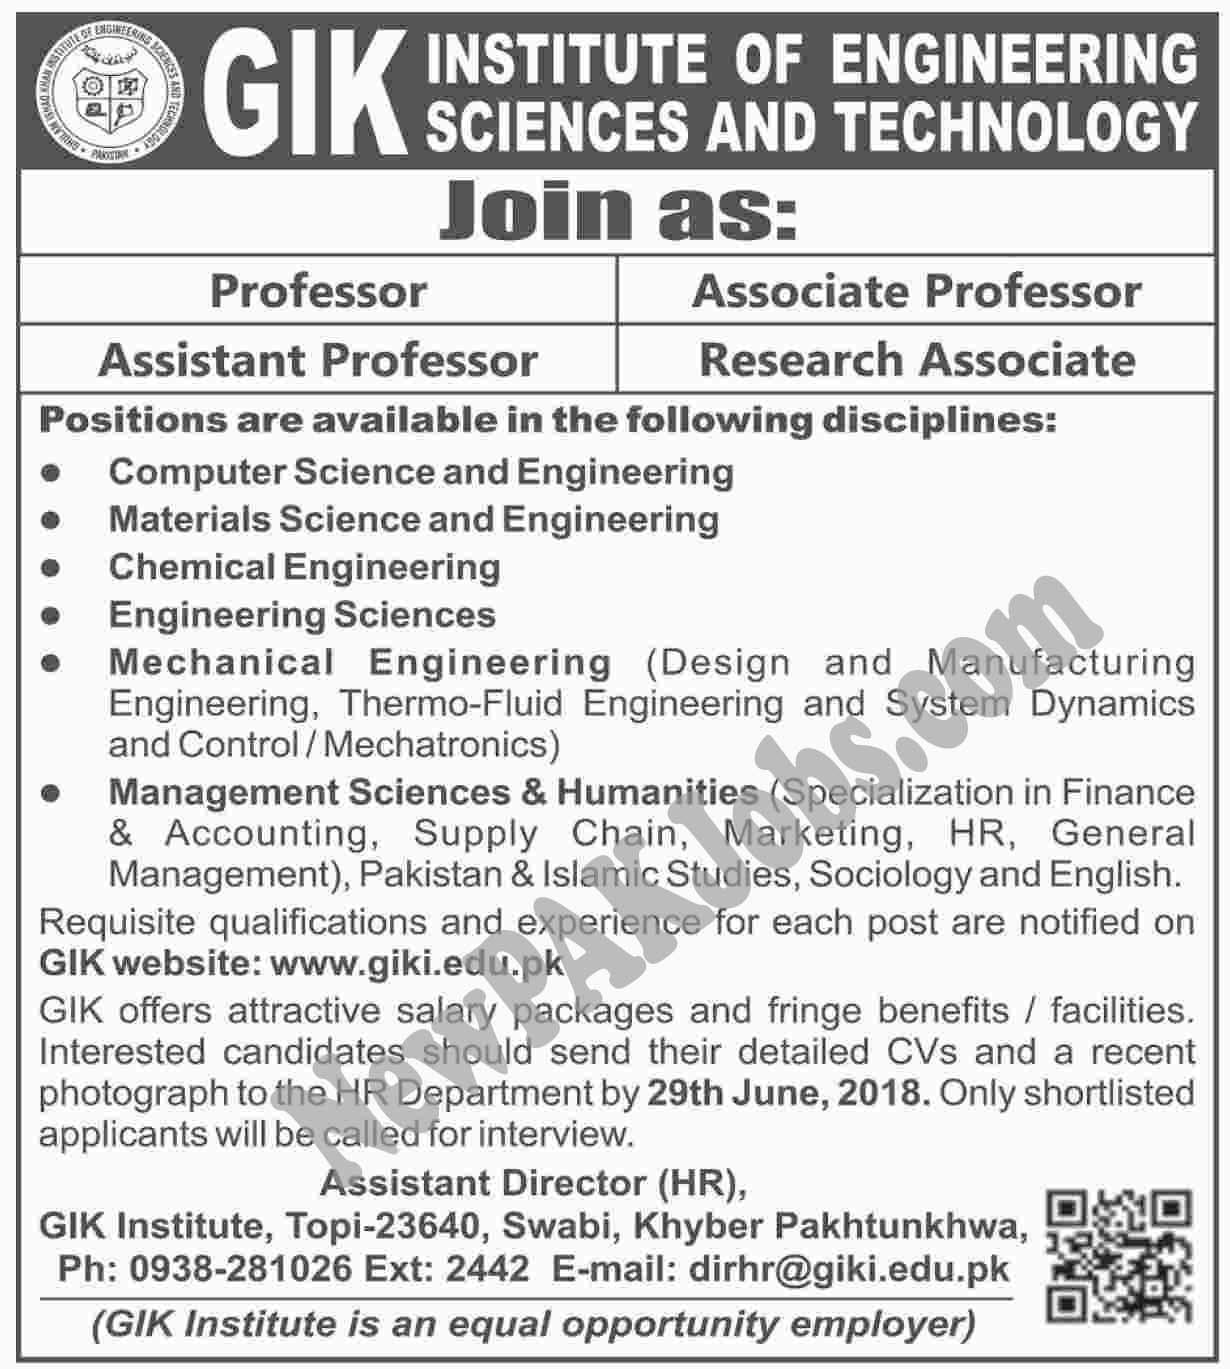 GIK Ghulam ishaq khan Institute of Engineering Sciences and Technology  | giki.edu.pk